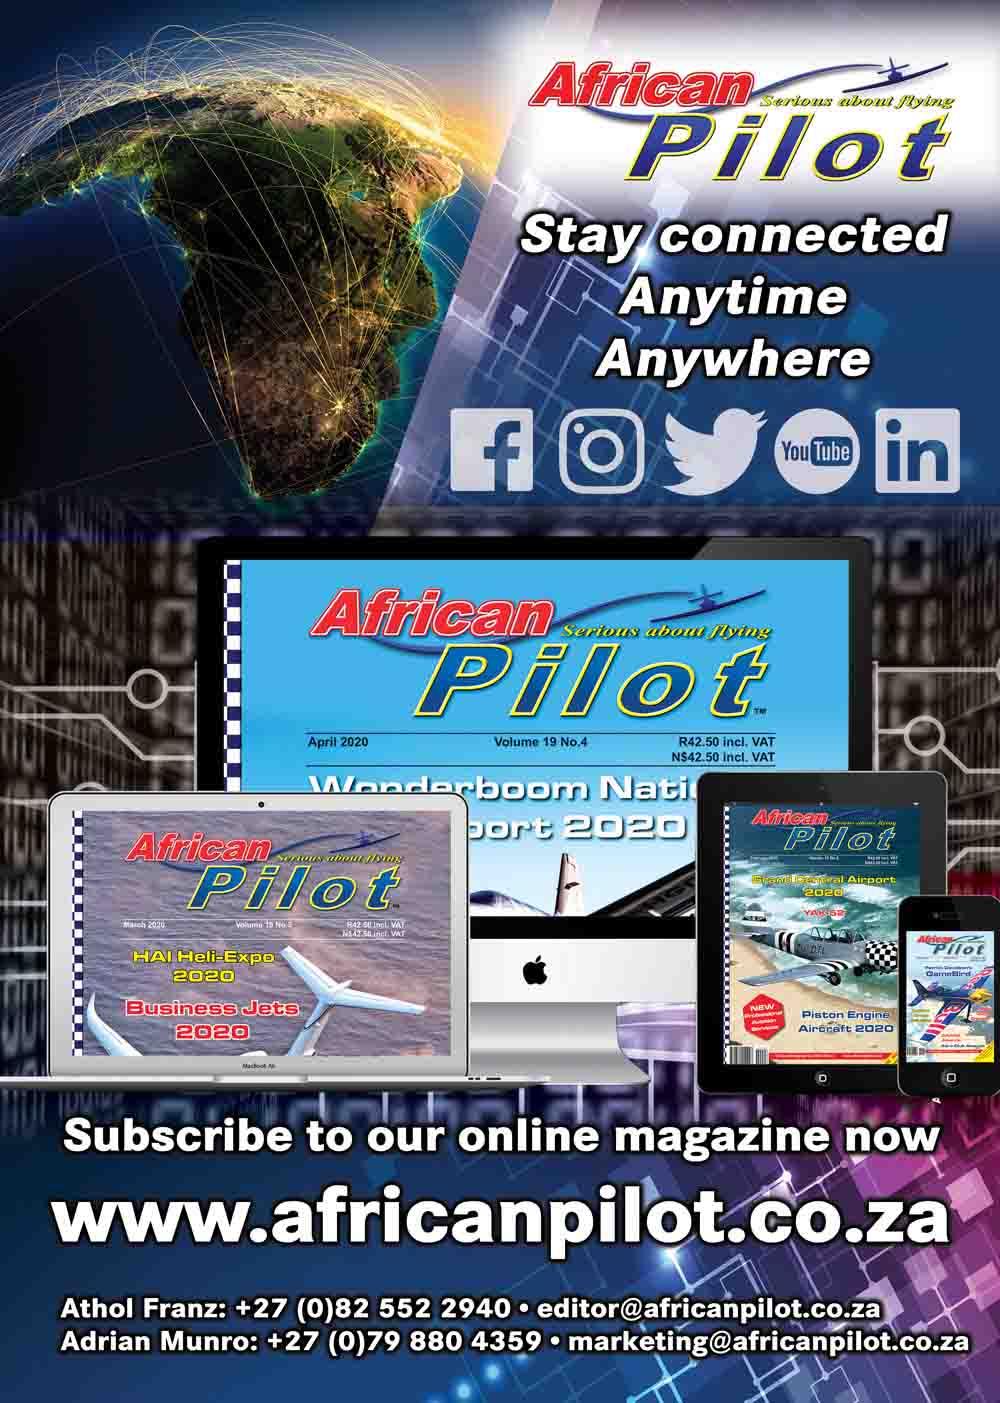 African Pilot digital